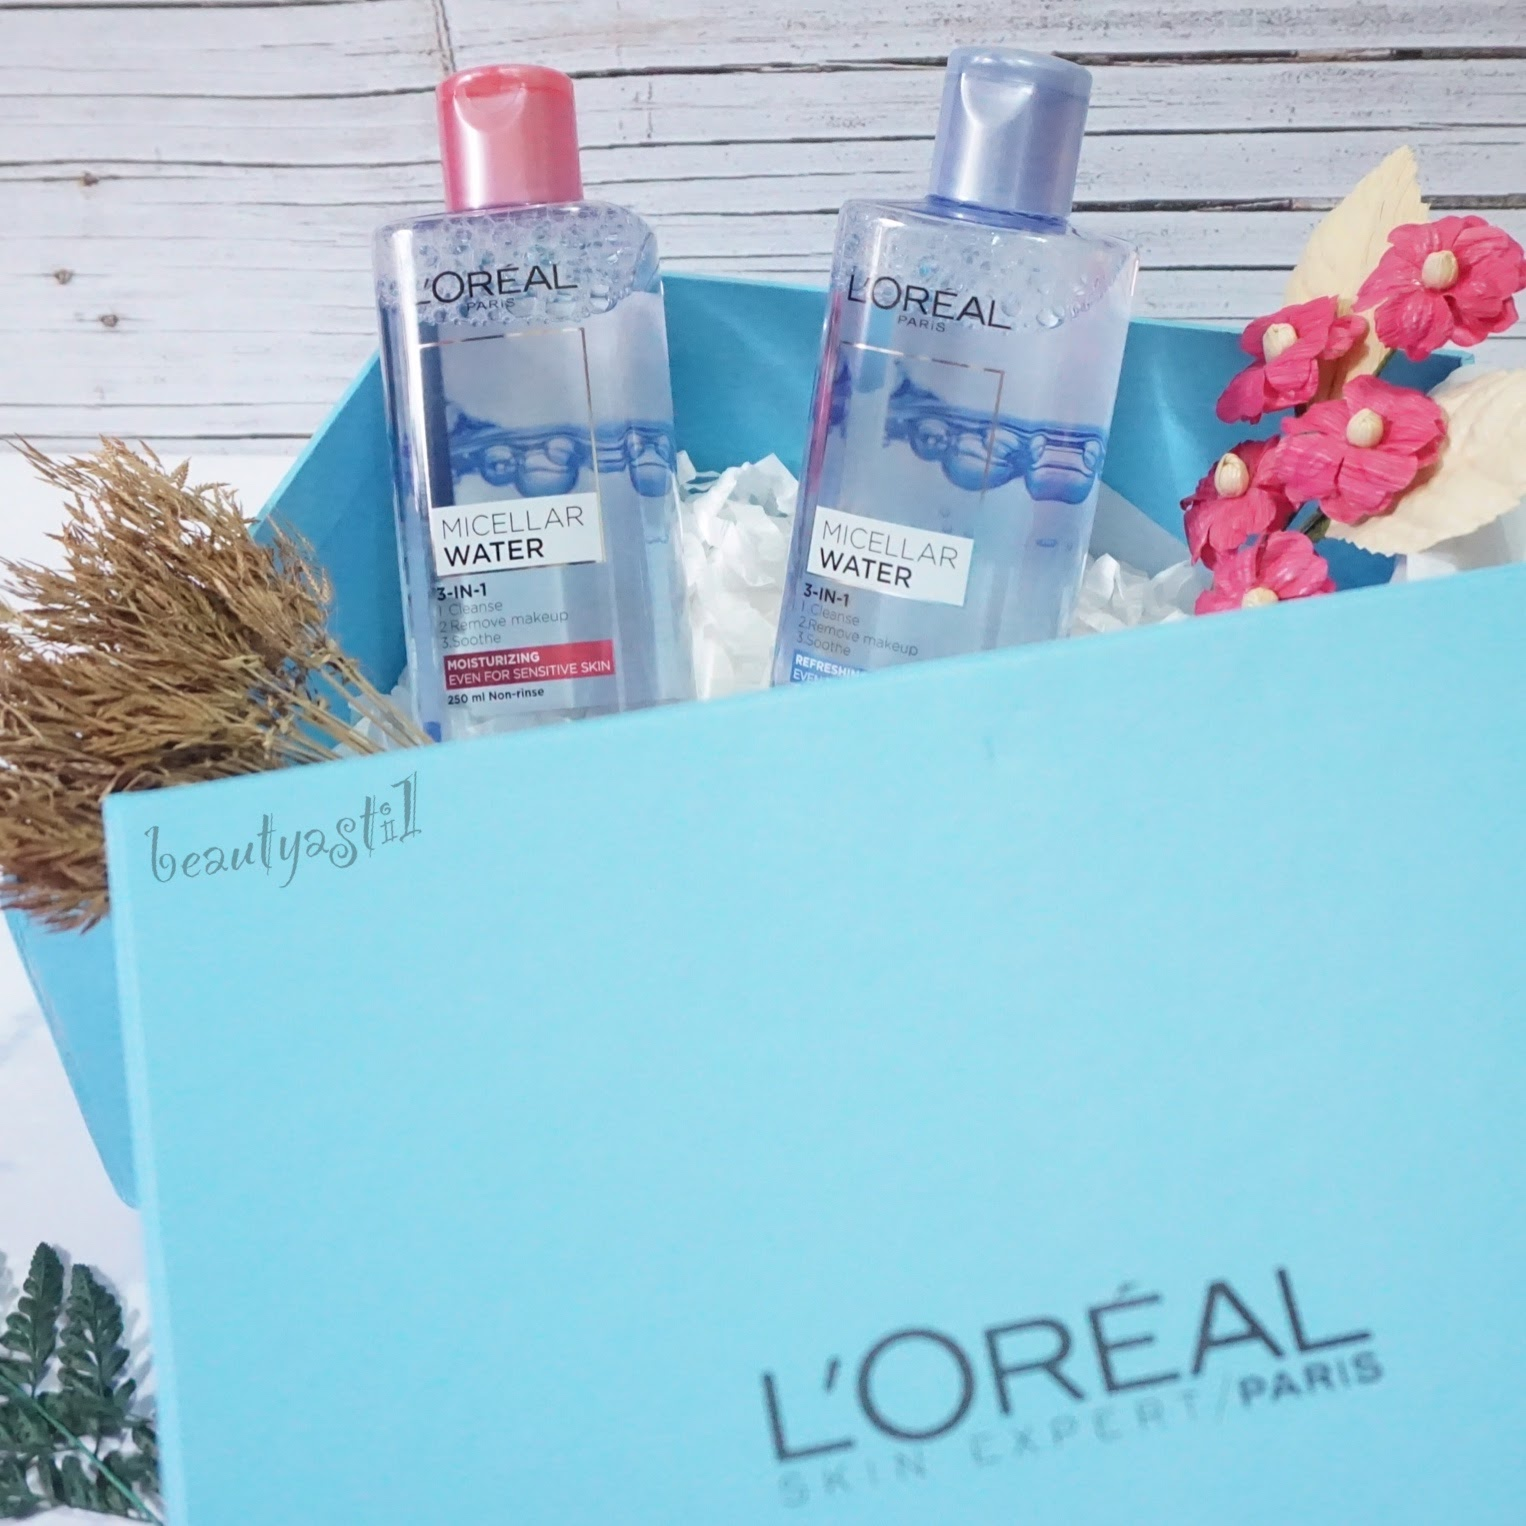 Loreal Paris Micellar Water Review Beautyasti1 L Oreal Makeup 250ml Blue Pink And